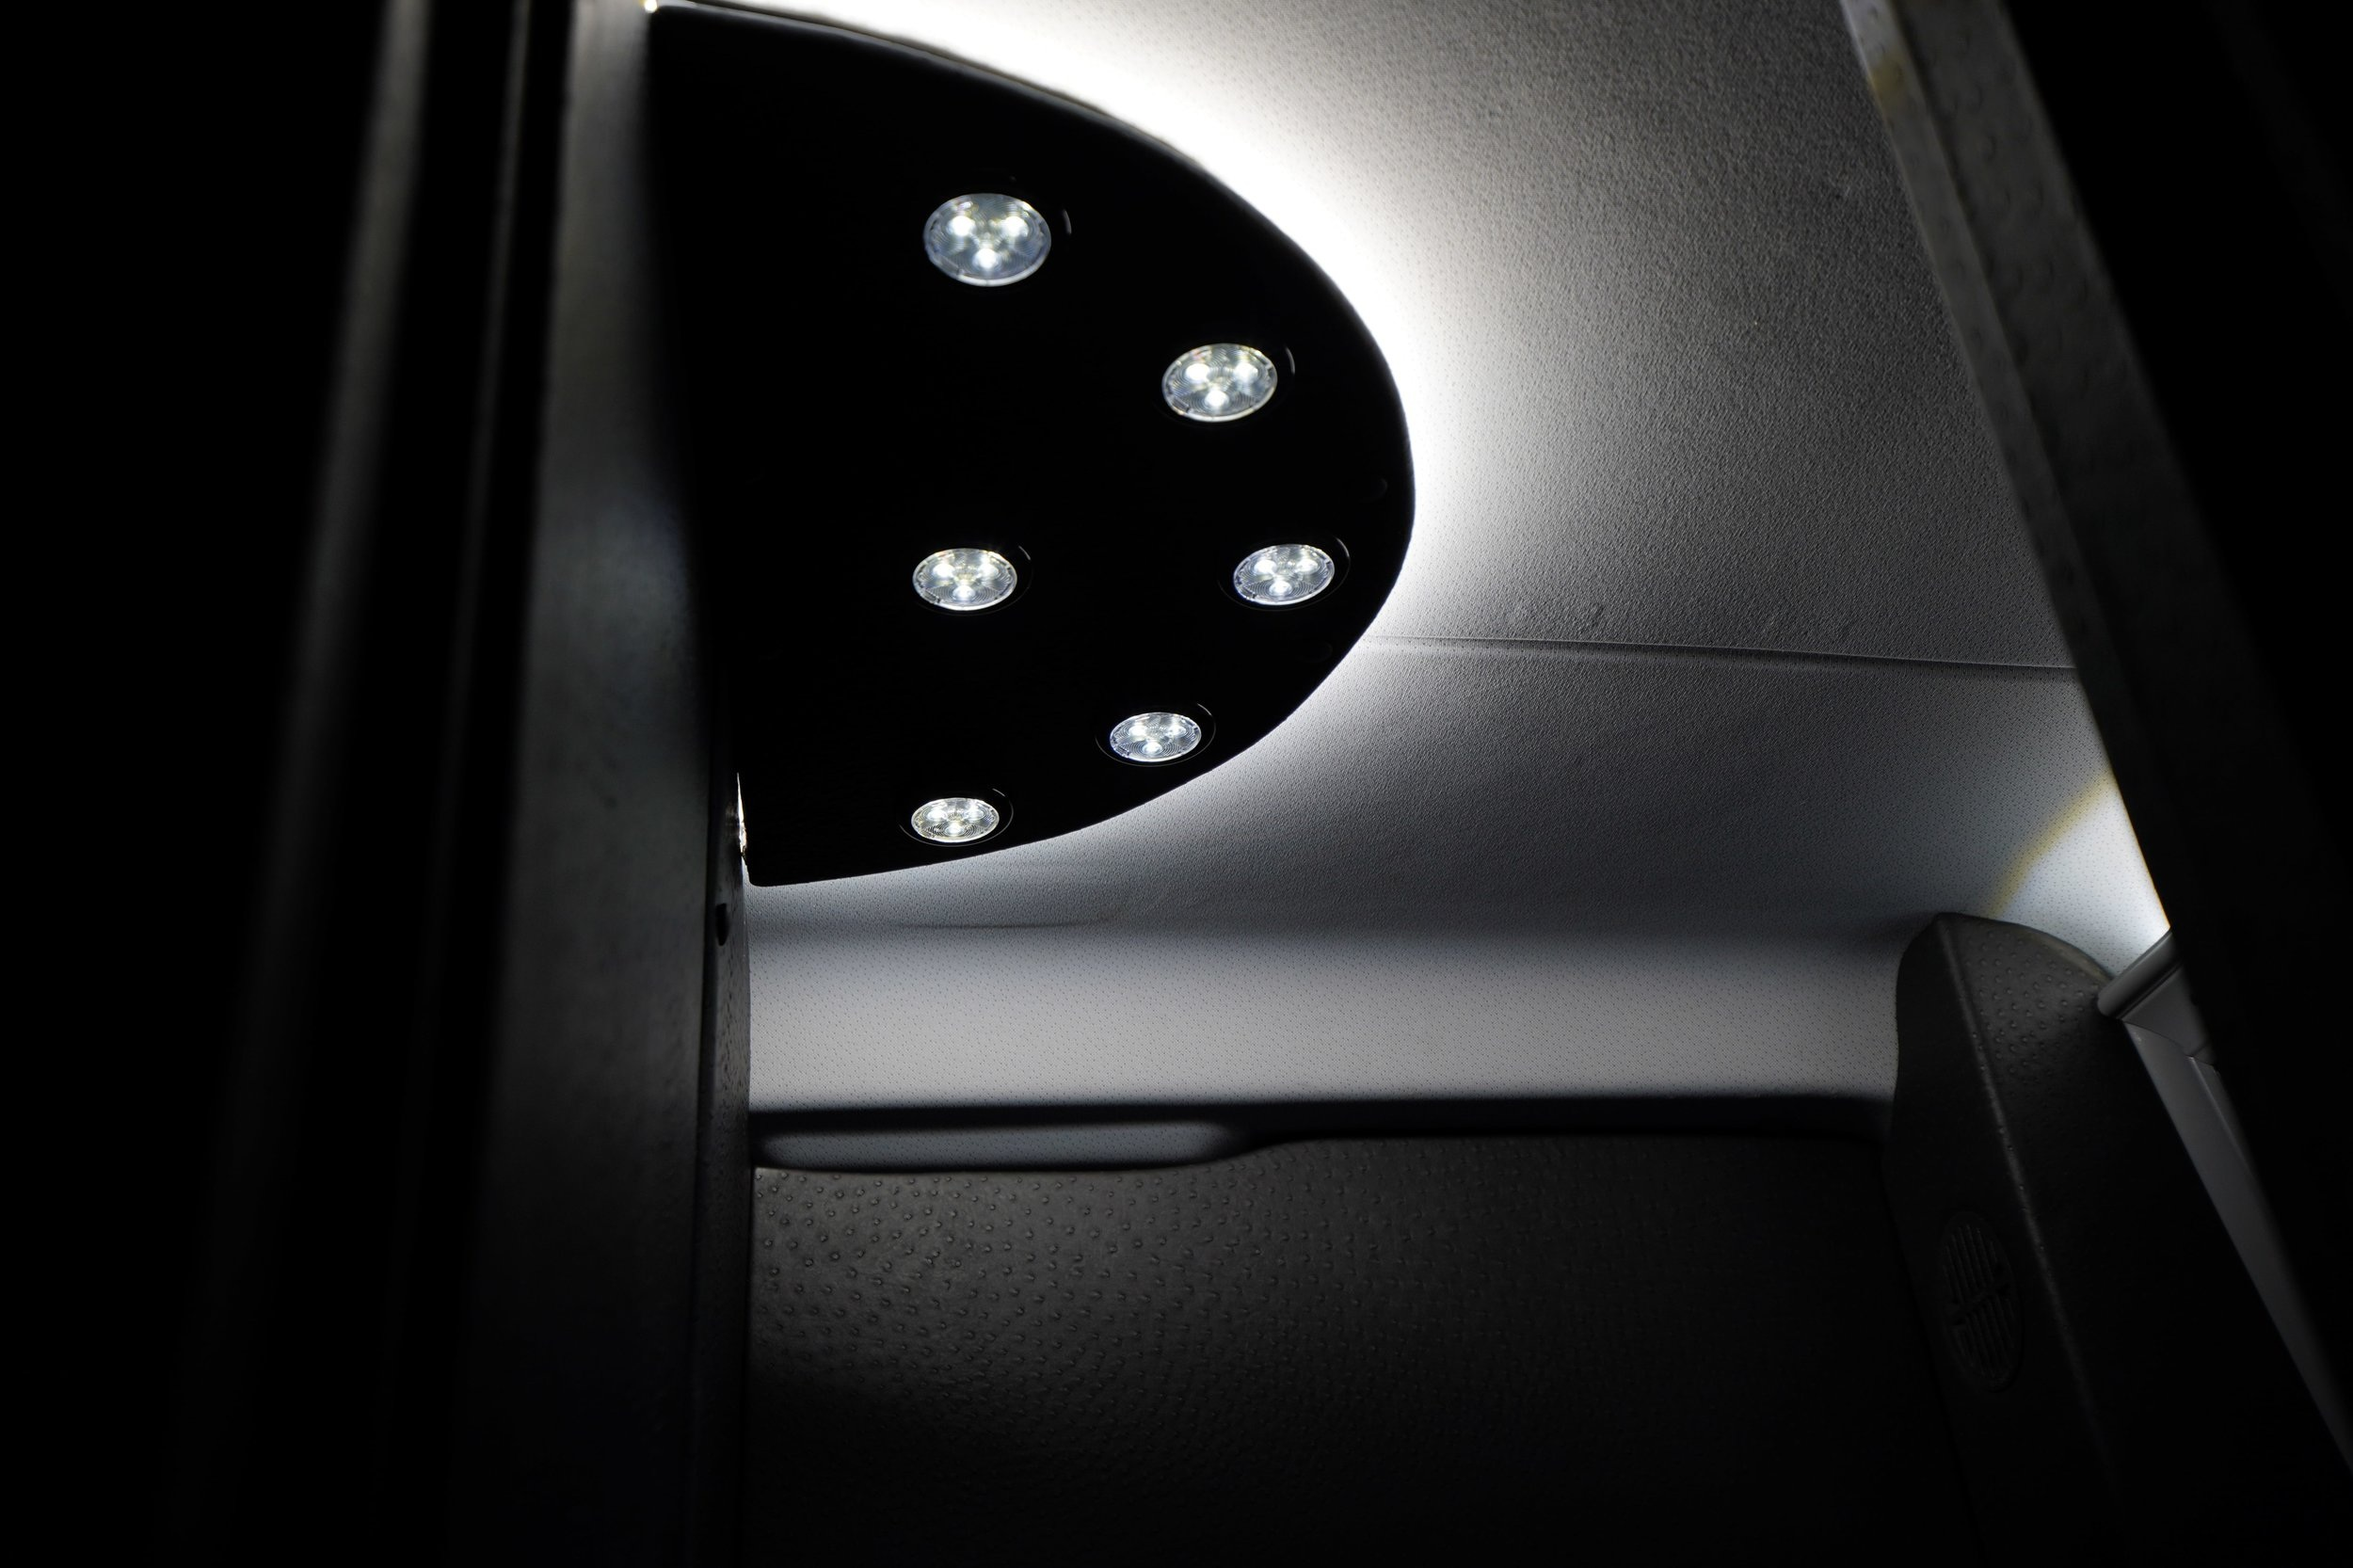 Van lighting - Freedom Conversions